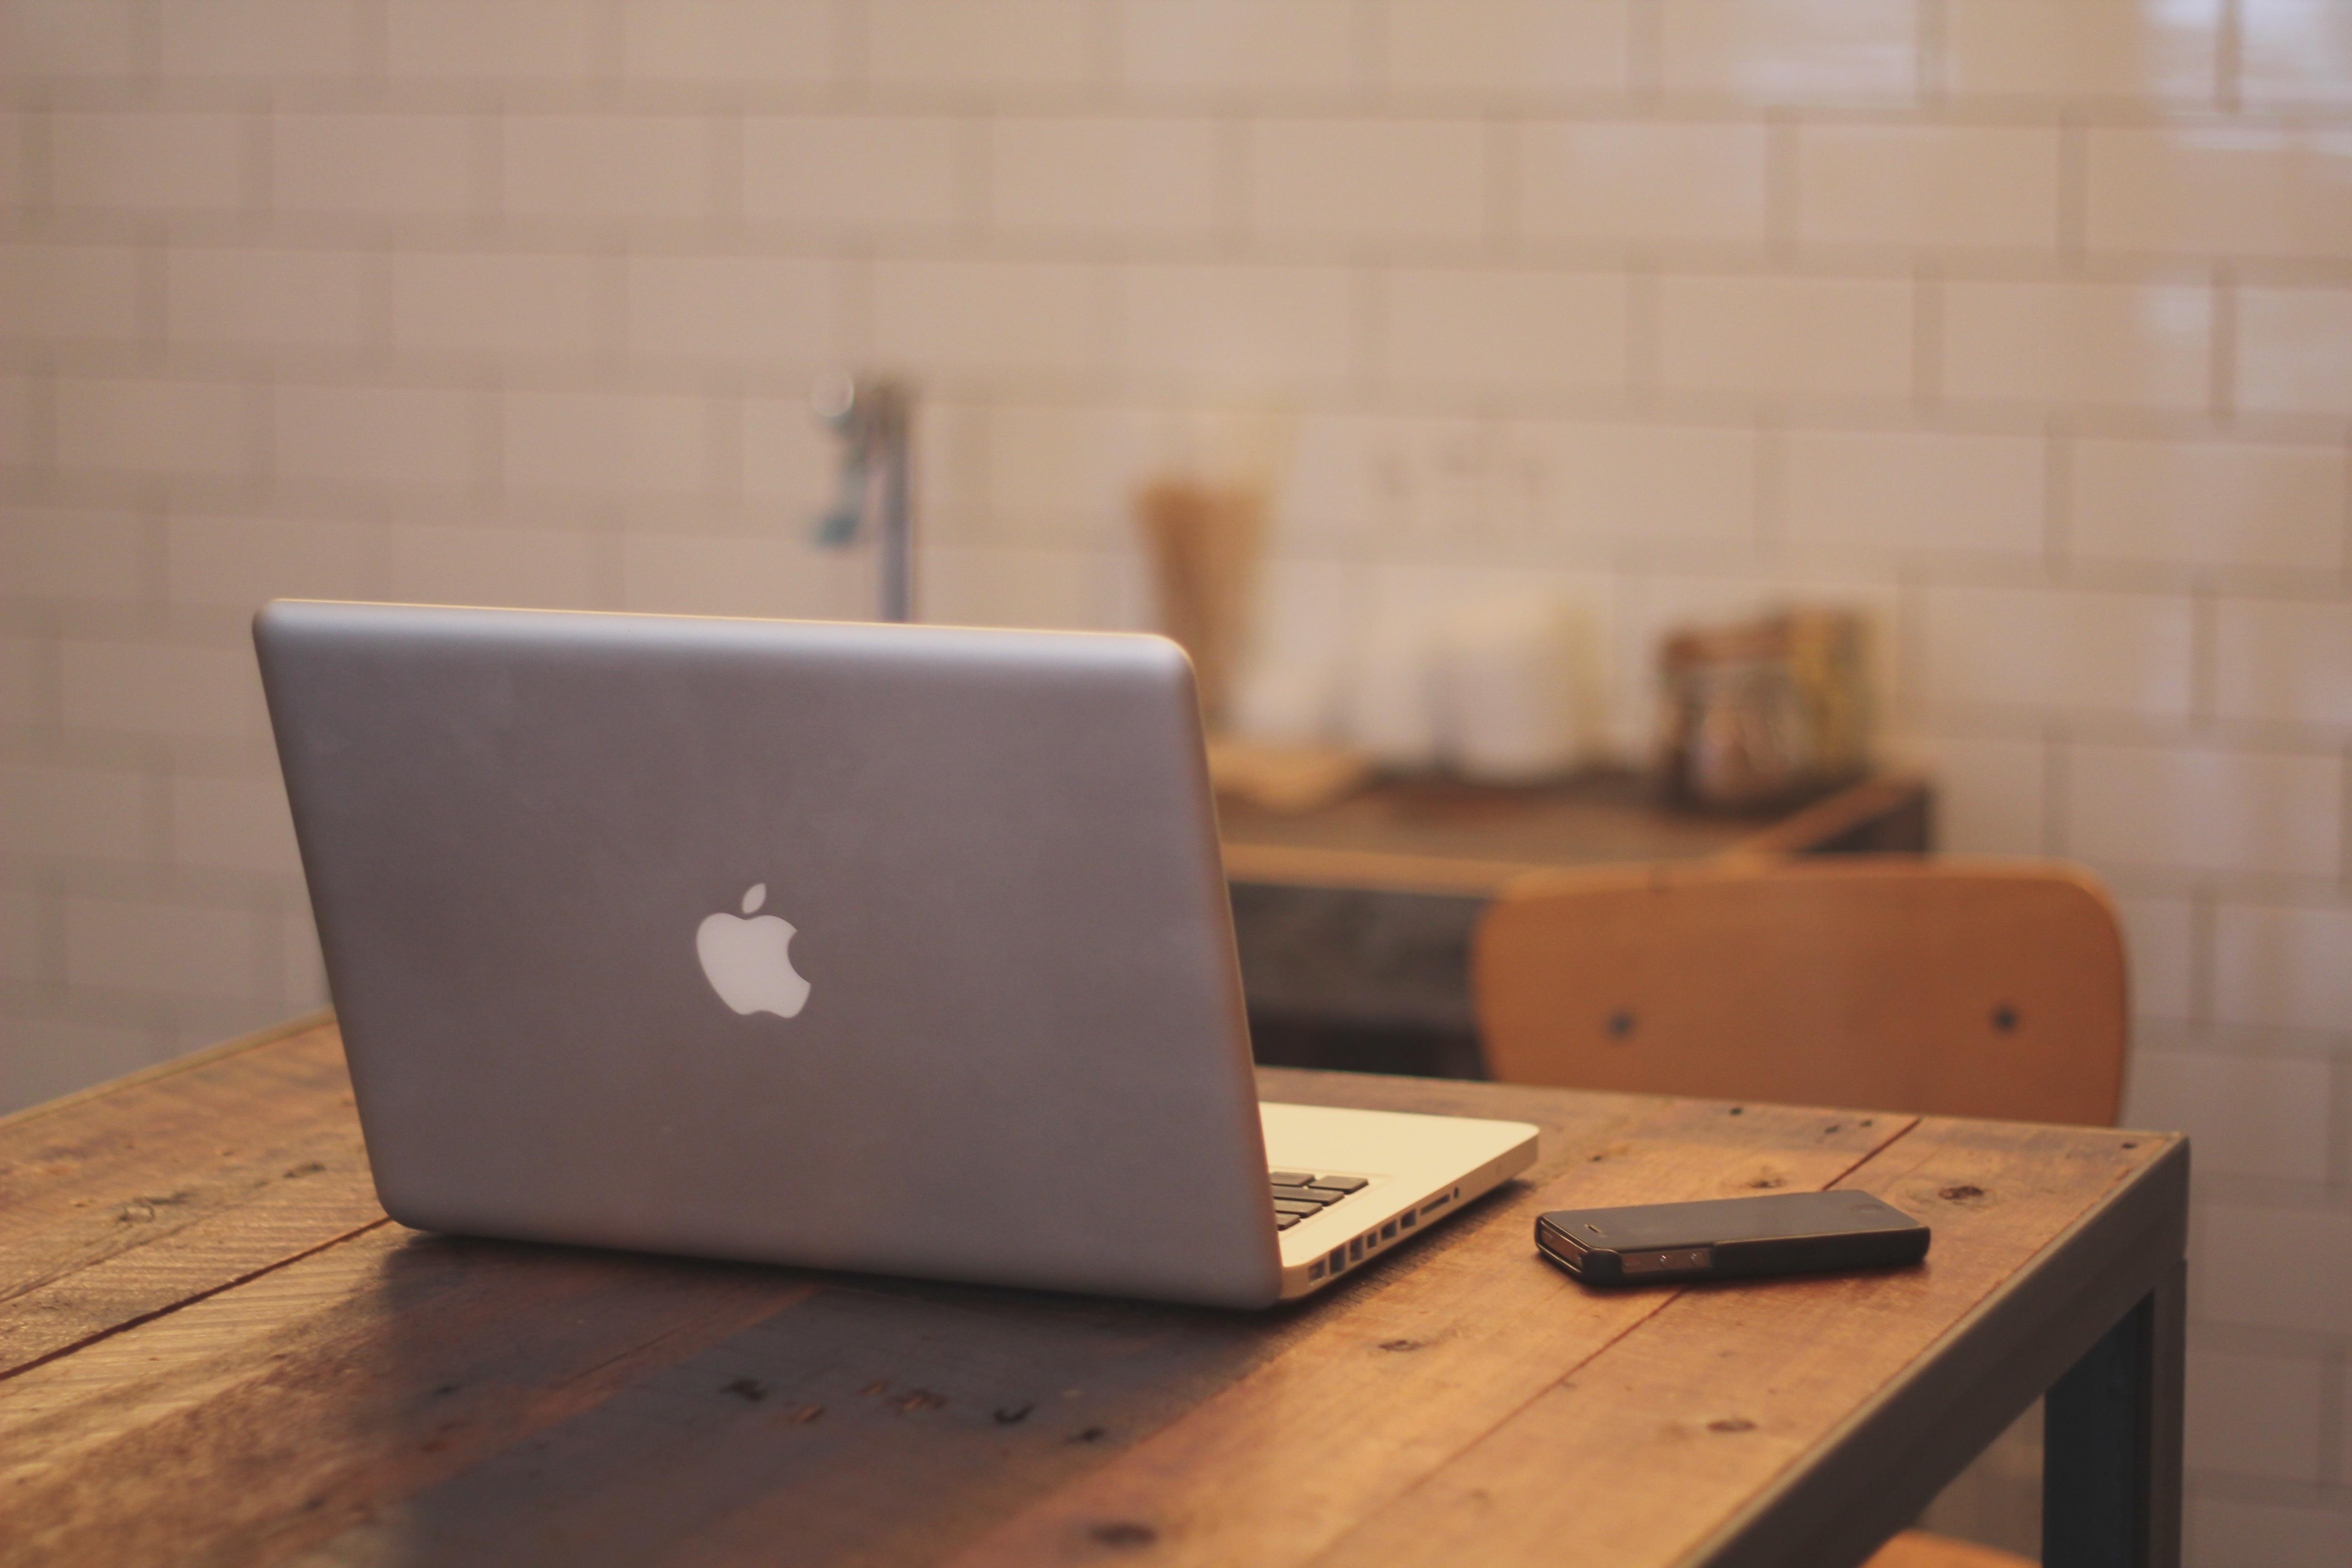 workstation lighting. Laptop Iphone Desk Notebook Macbook Writing Apple Table Wood Technology Chair Office Shelf Business Furniture Room Workstation Lighting